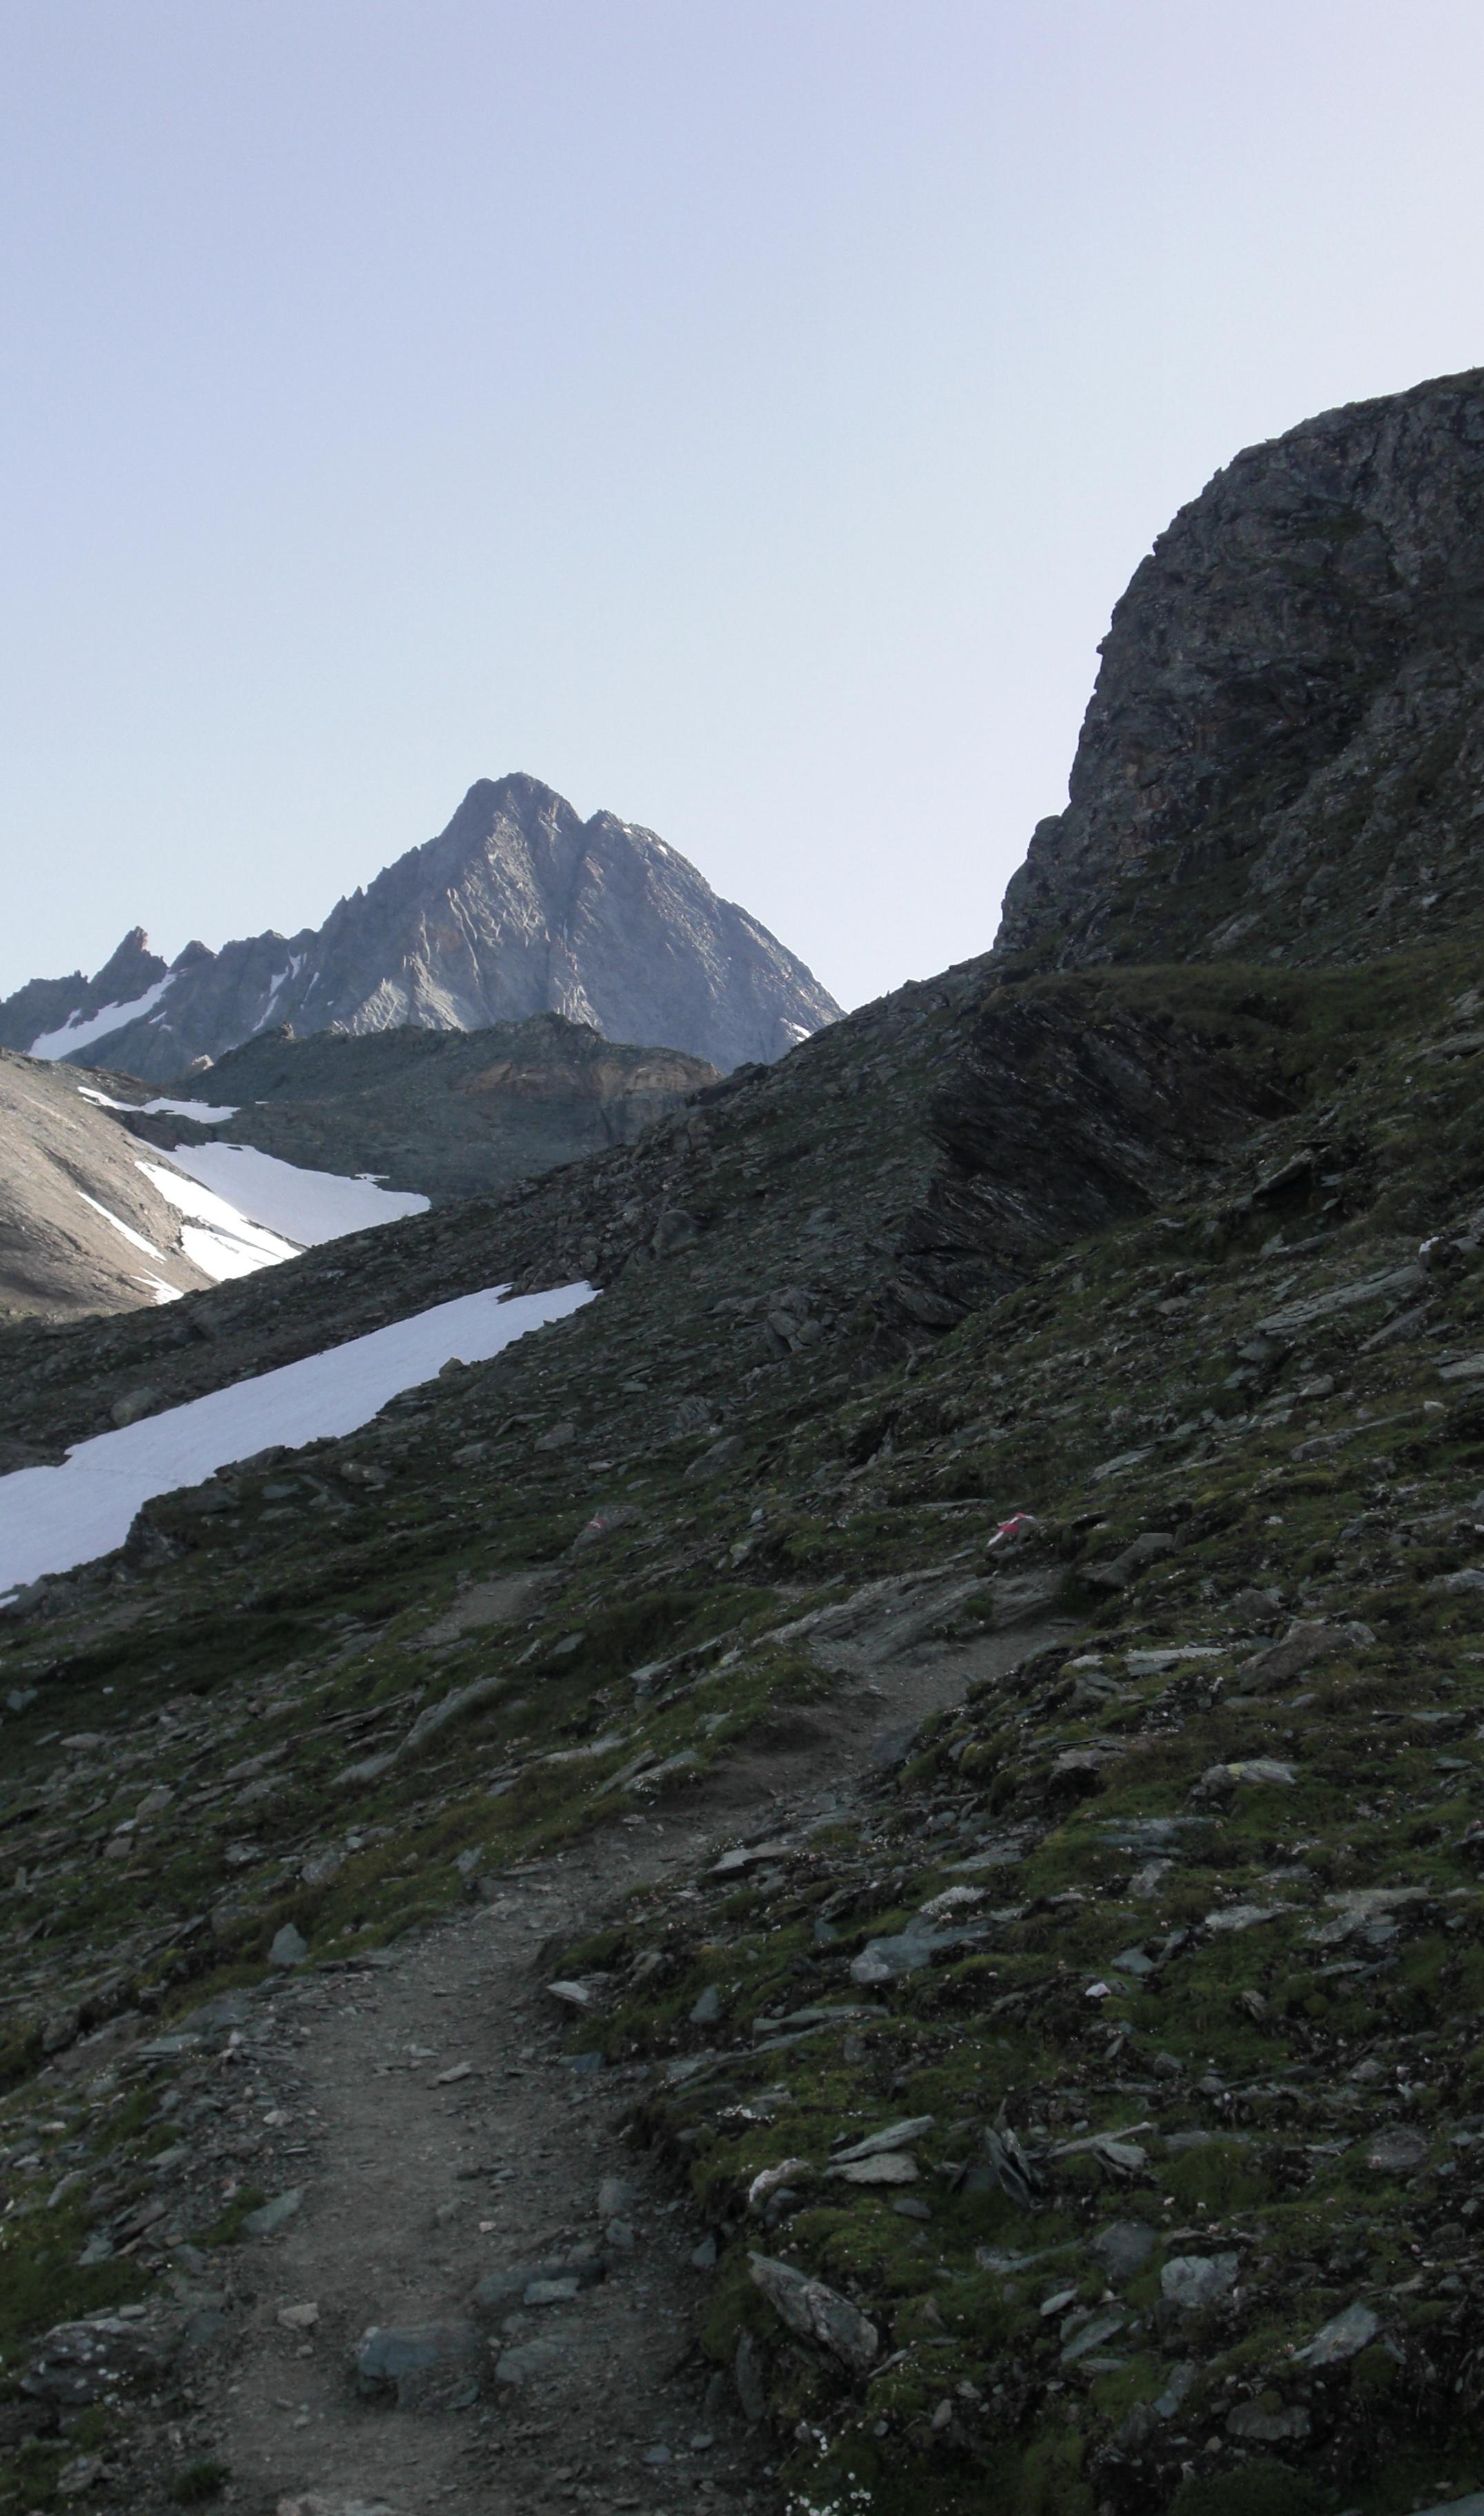 Wandertour Teischnitztal - Stüdlhütte